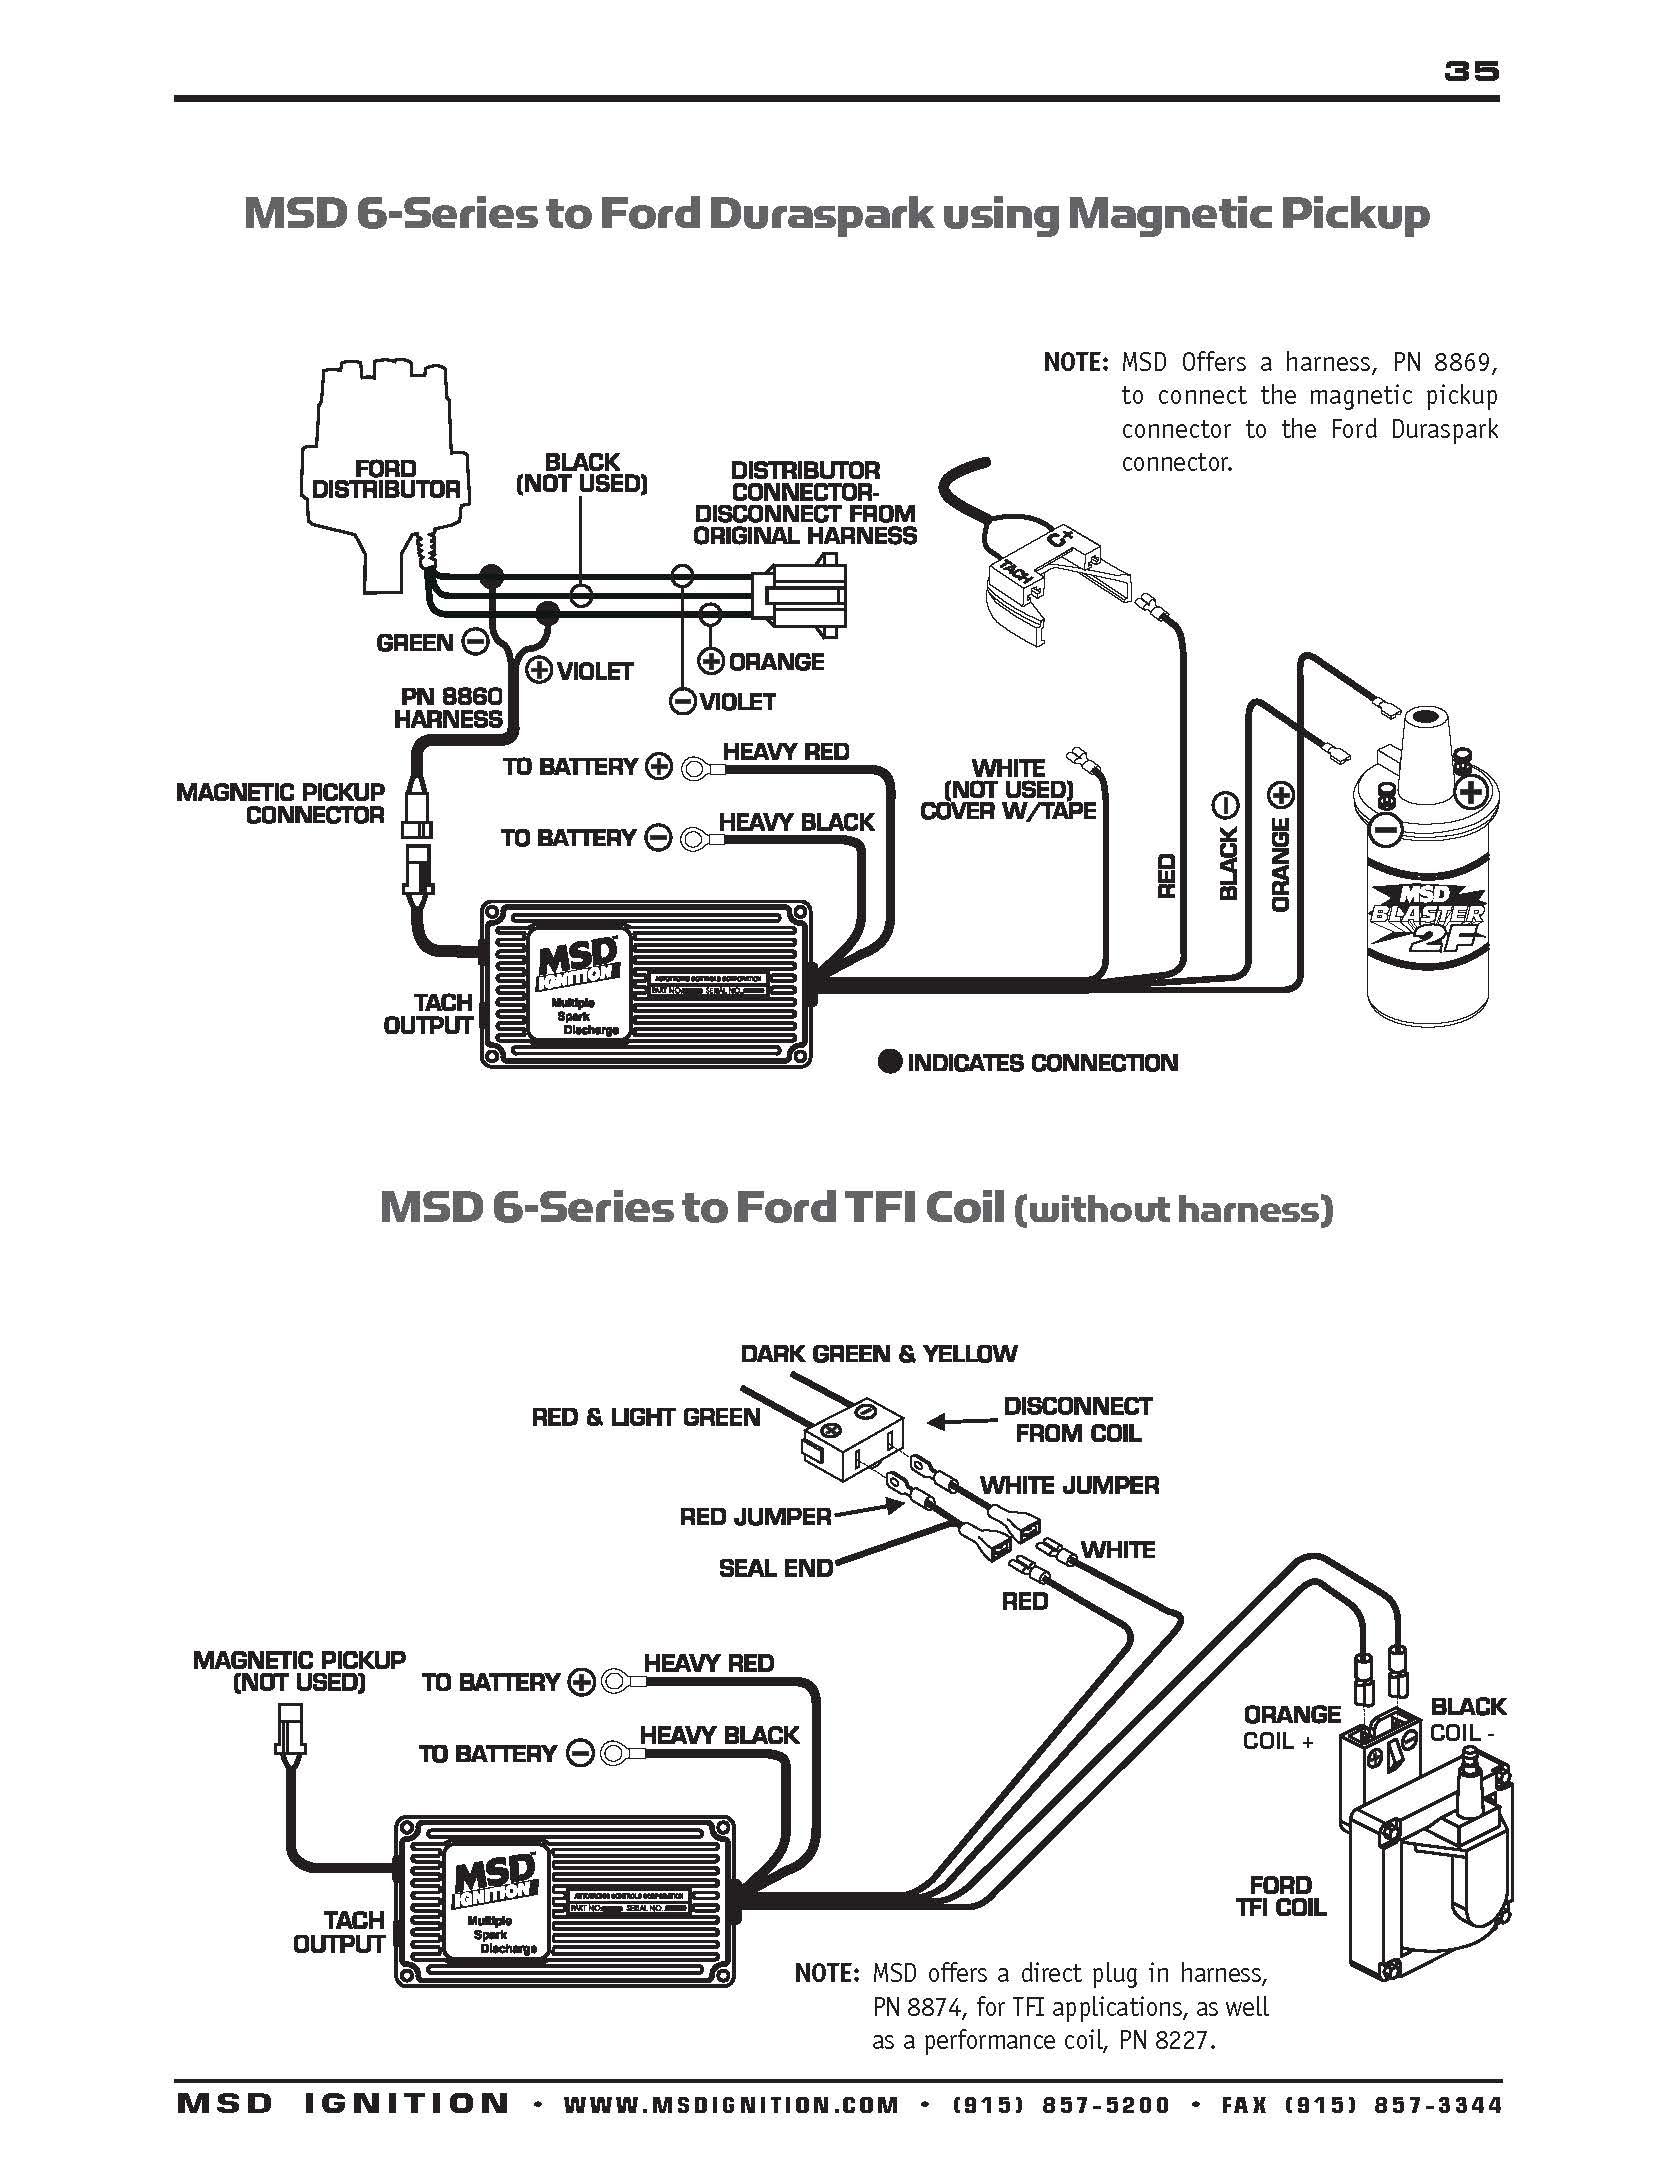 Ford Duraspark Wiring Diagram : duraspark, wiring, diagram, Duraspark, Ignition, Wiring, Diagram, Girl-owner, Girl-owner.faishoppingconsvitol.it